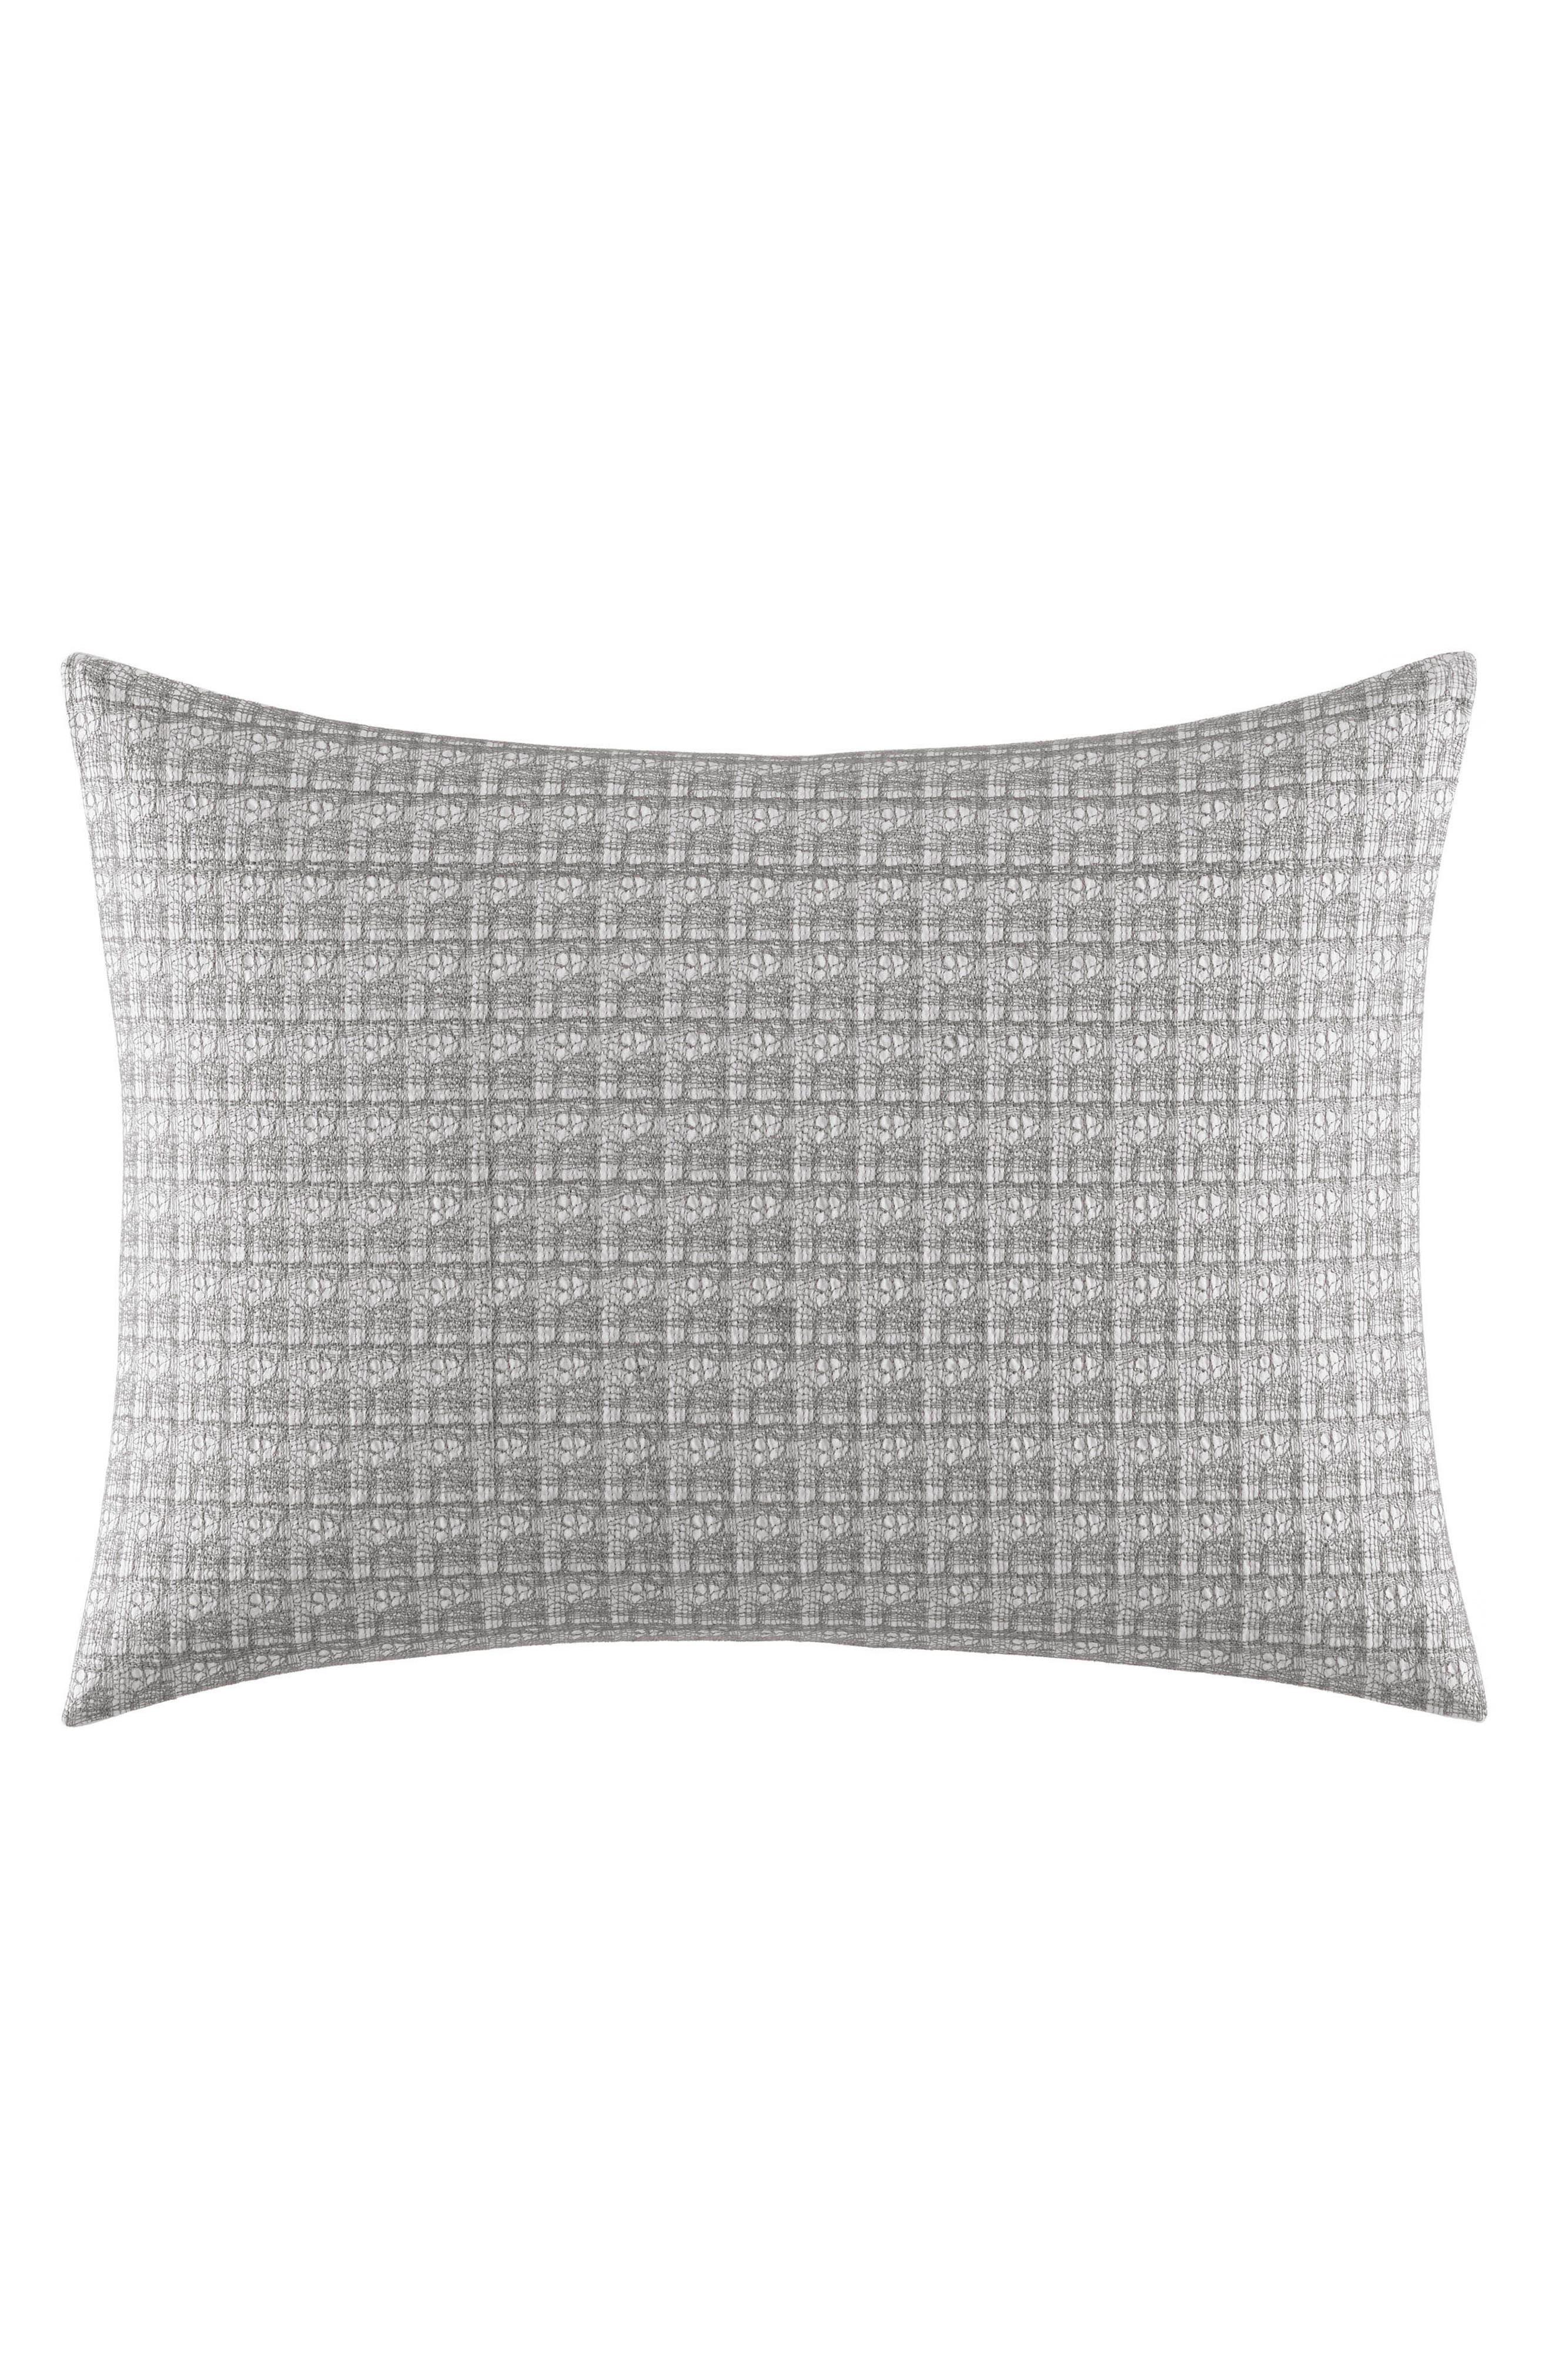 Main Image - Vera Wang Mirrored Breakfast Accent Pillow